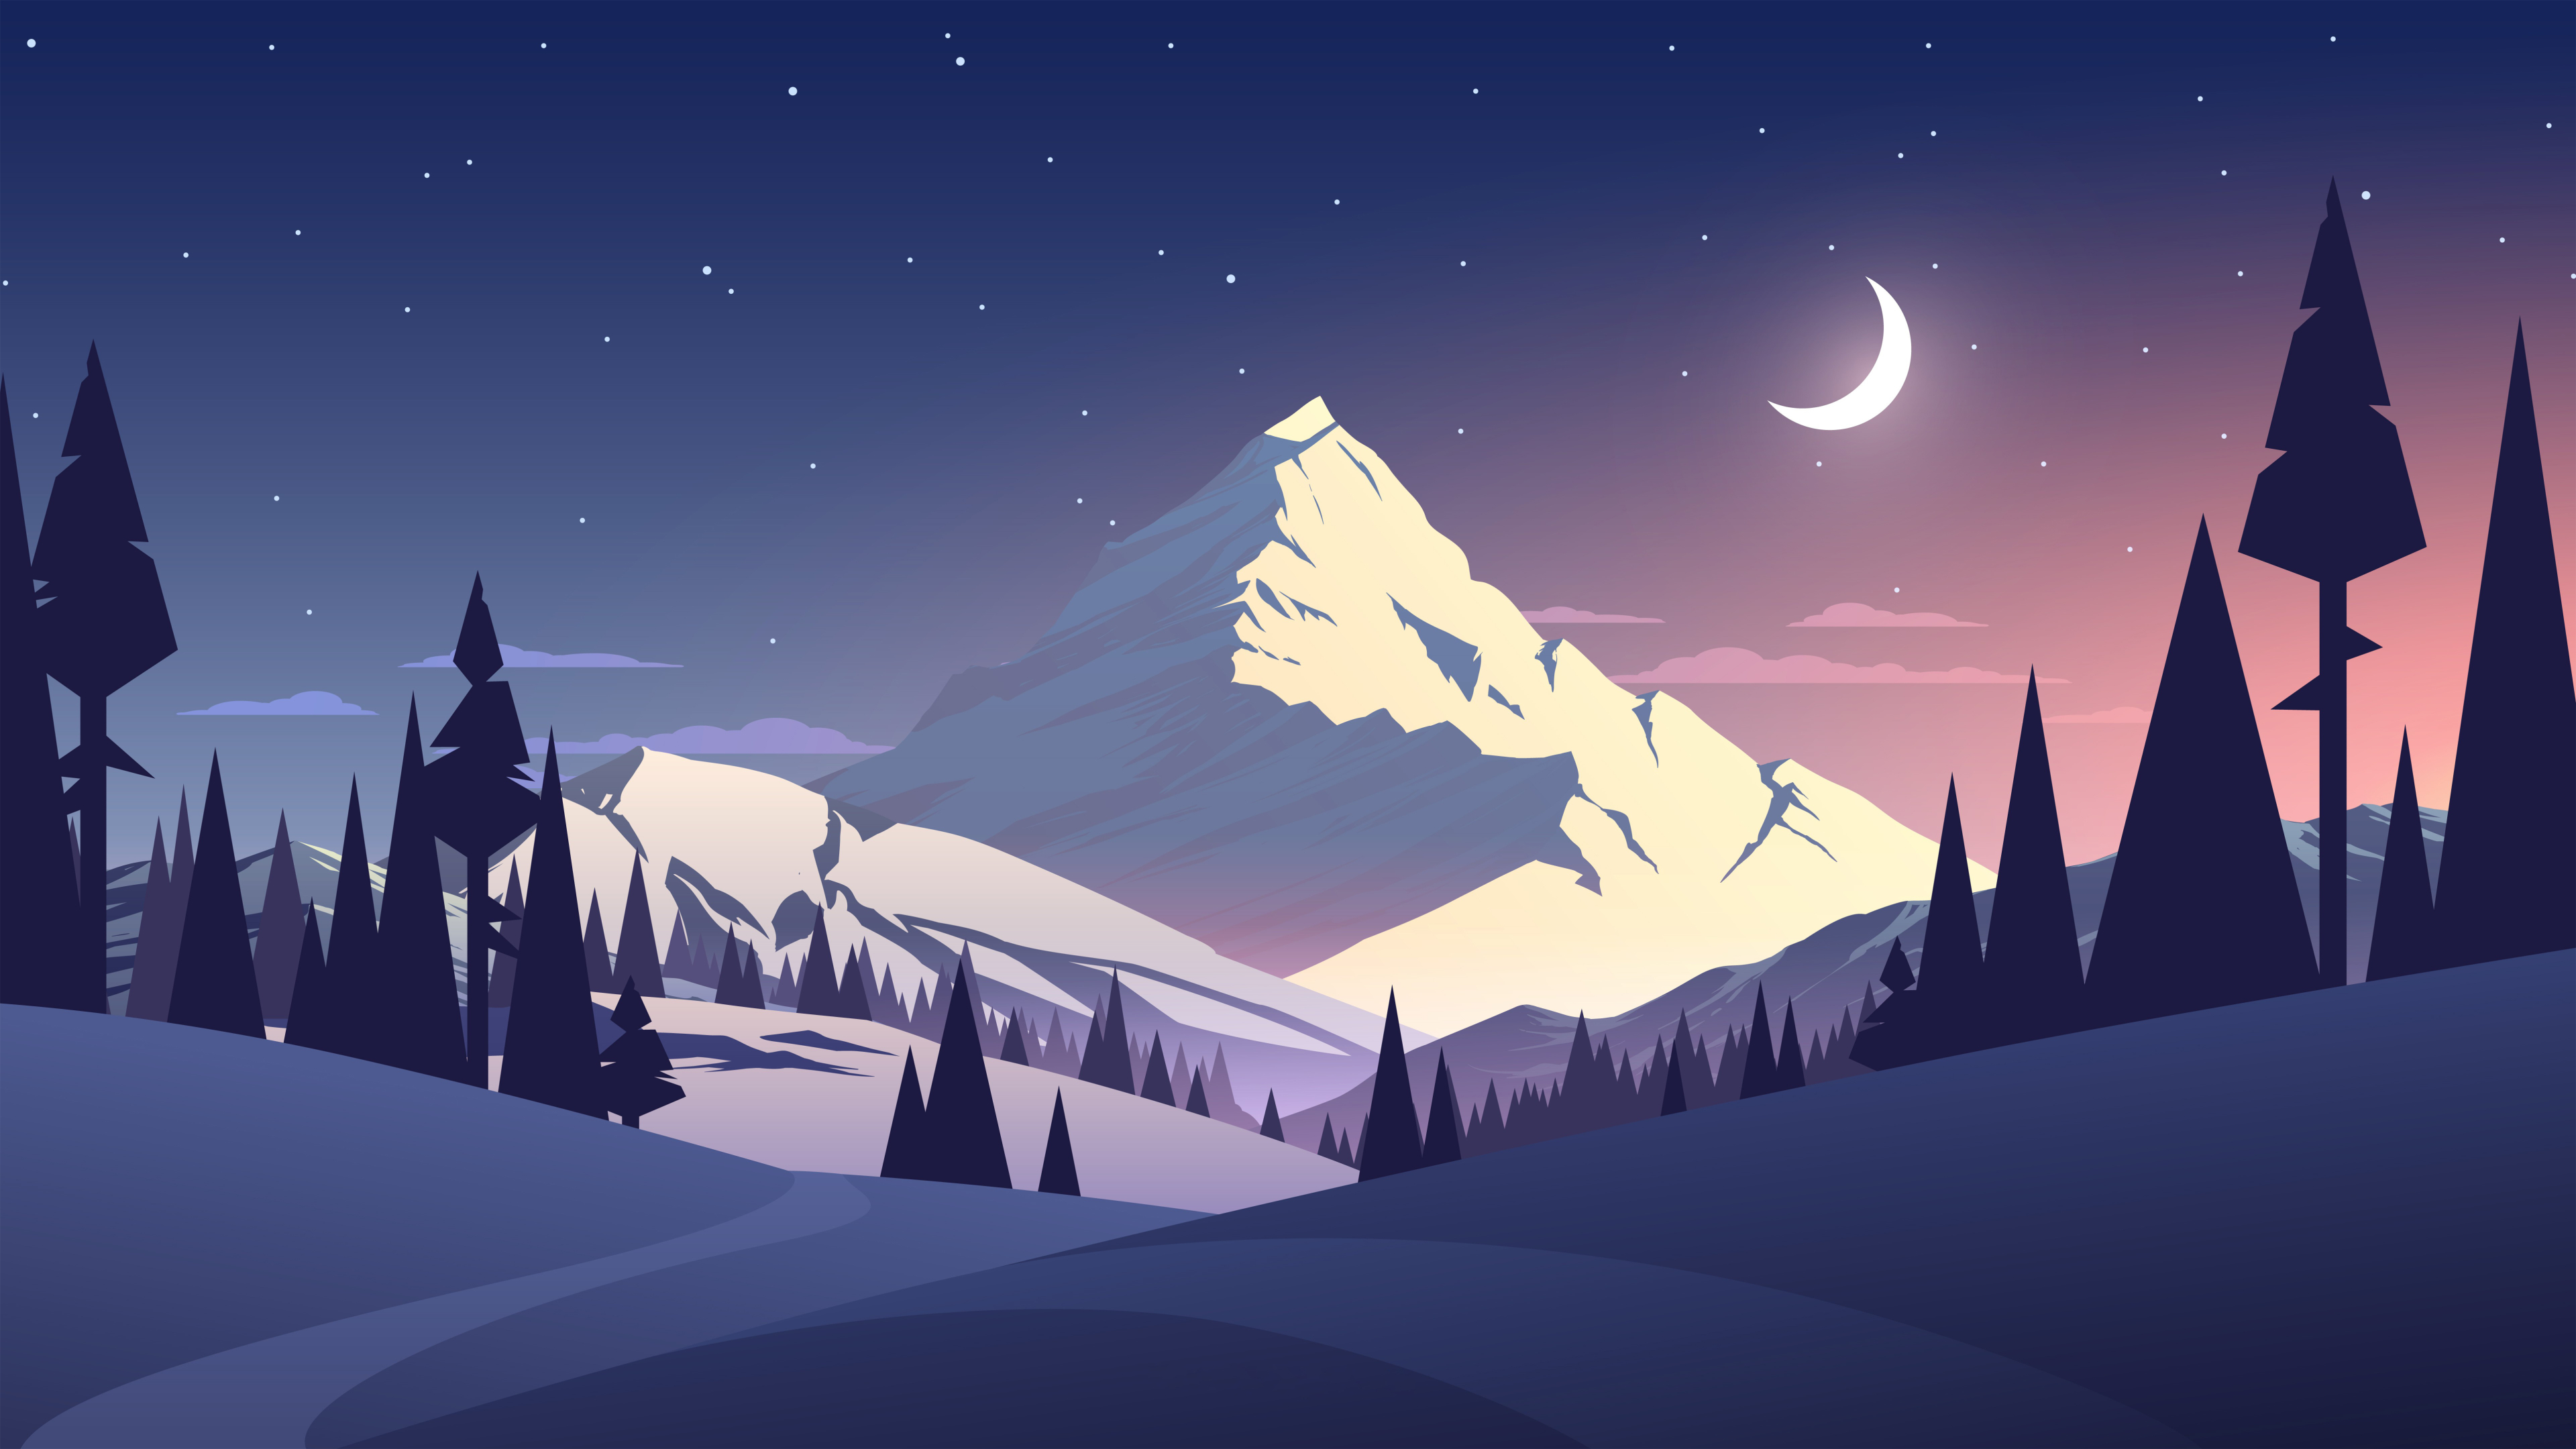 3840x2160 Night Mountains Summer Illustration 4k Wallpaper